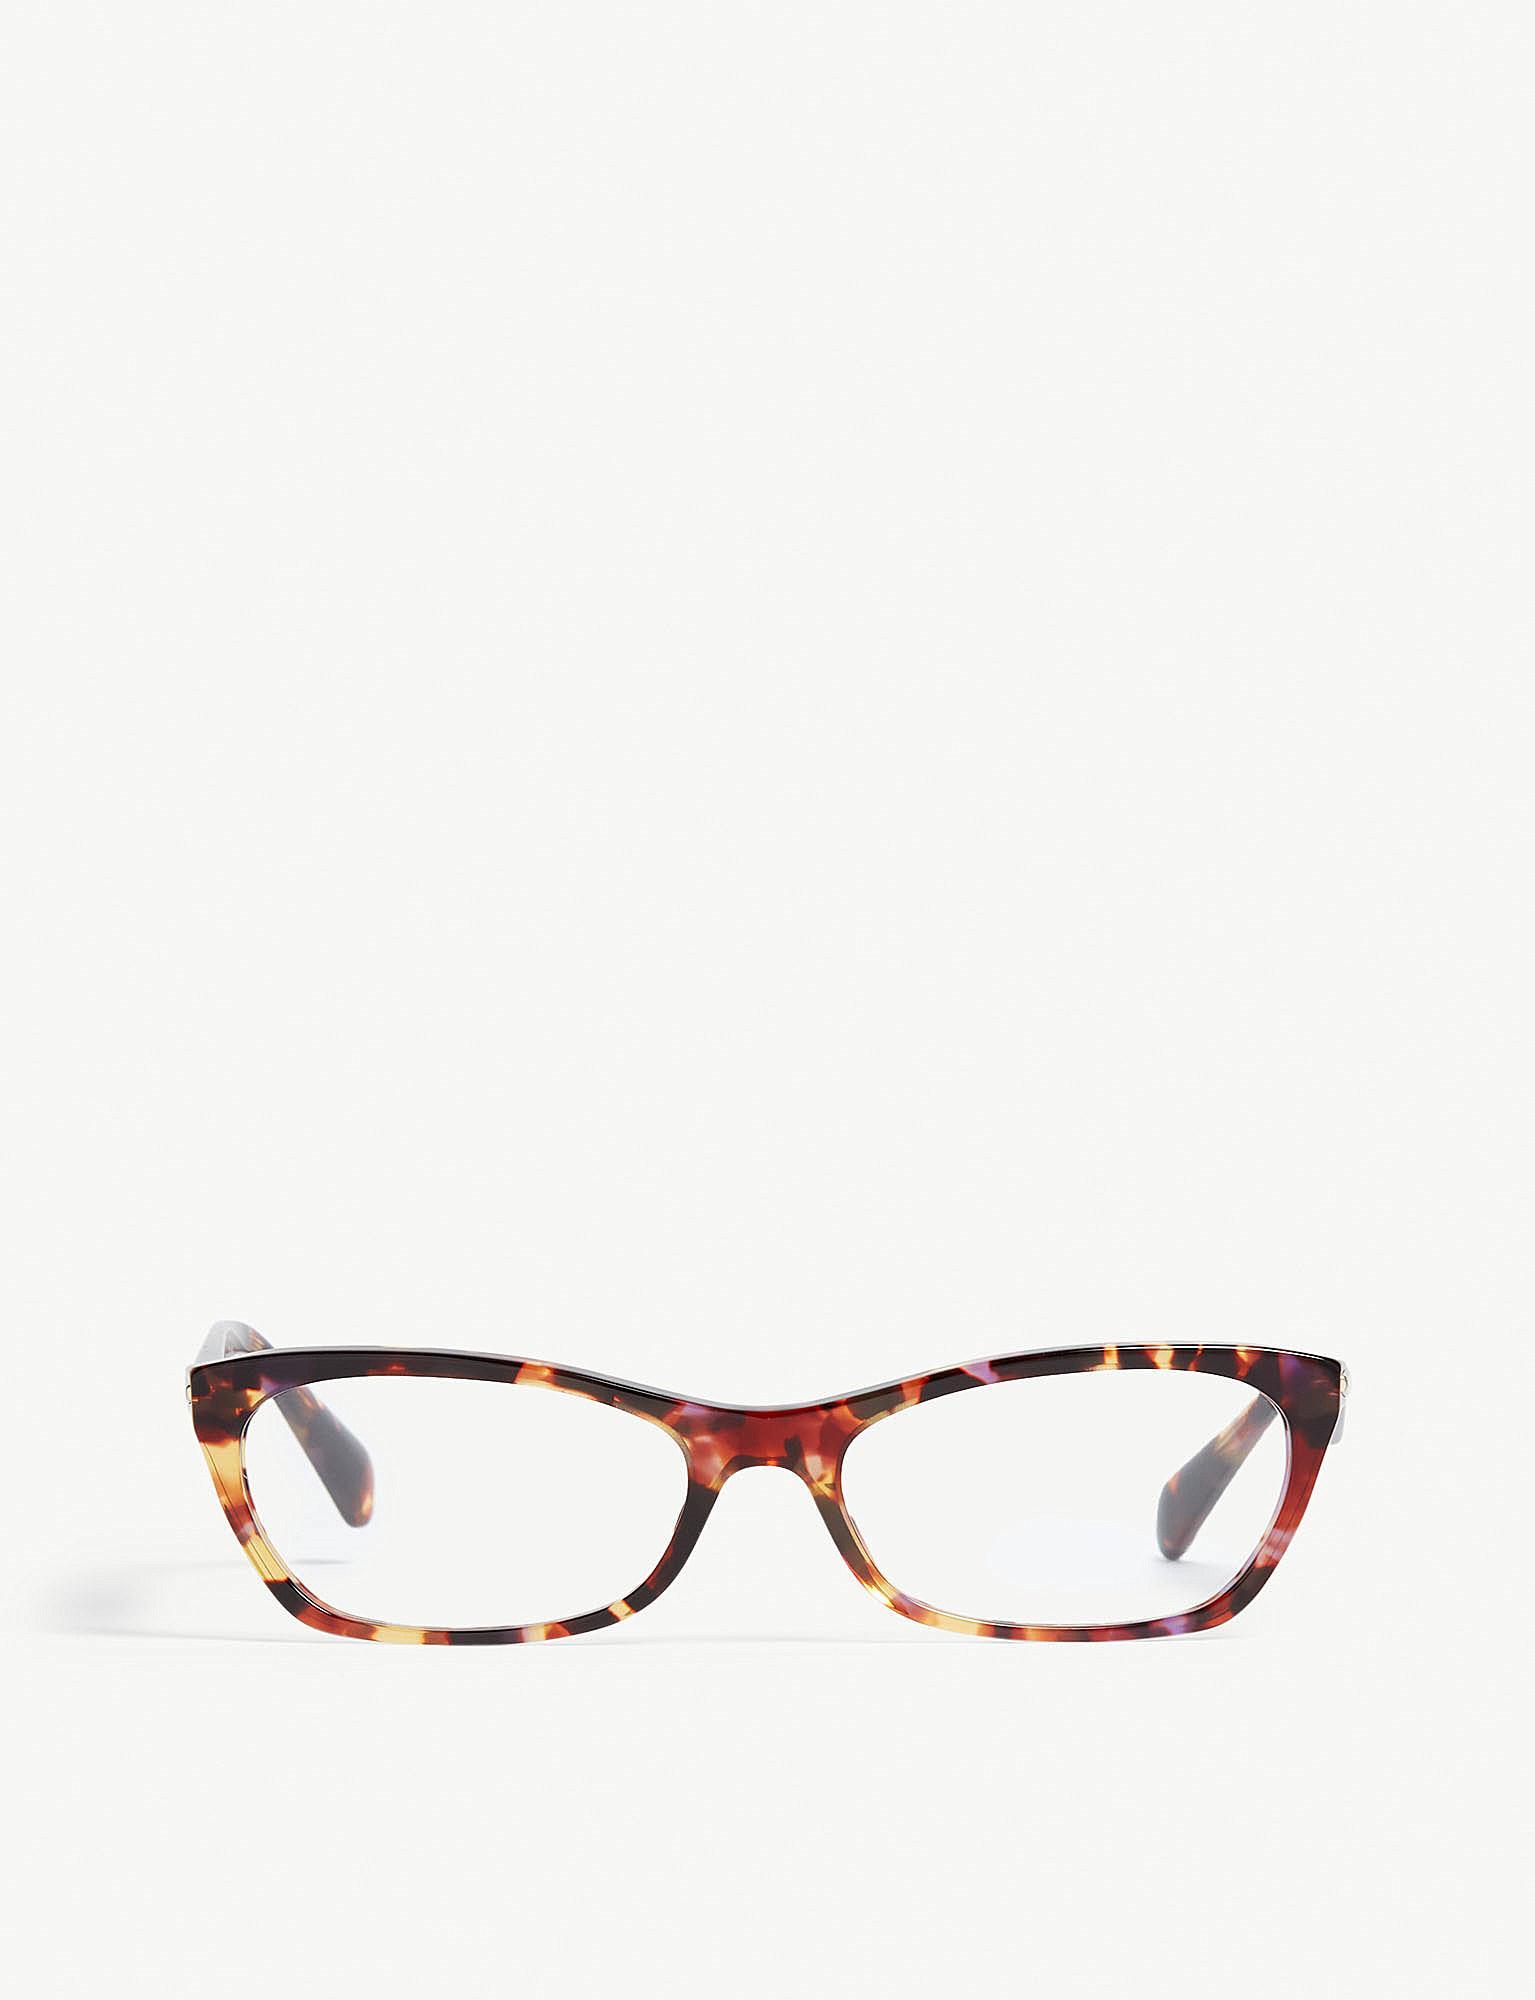 76faa9d1e53 Lyst - Prada Womens Purple Vpr15p Cat-eye-frame Glasses in Purple